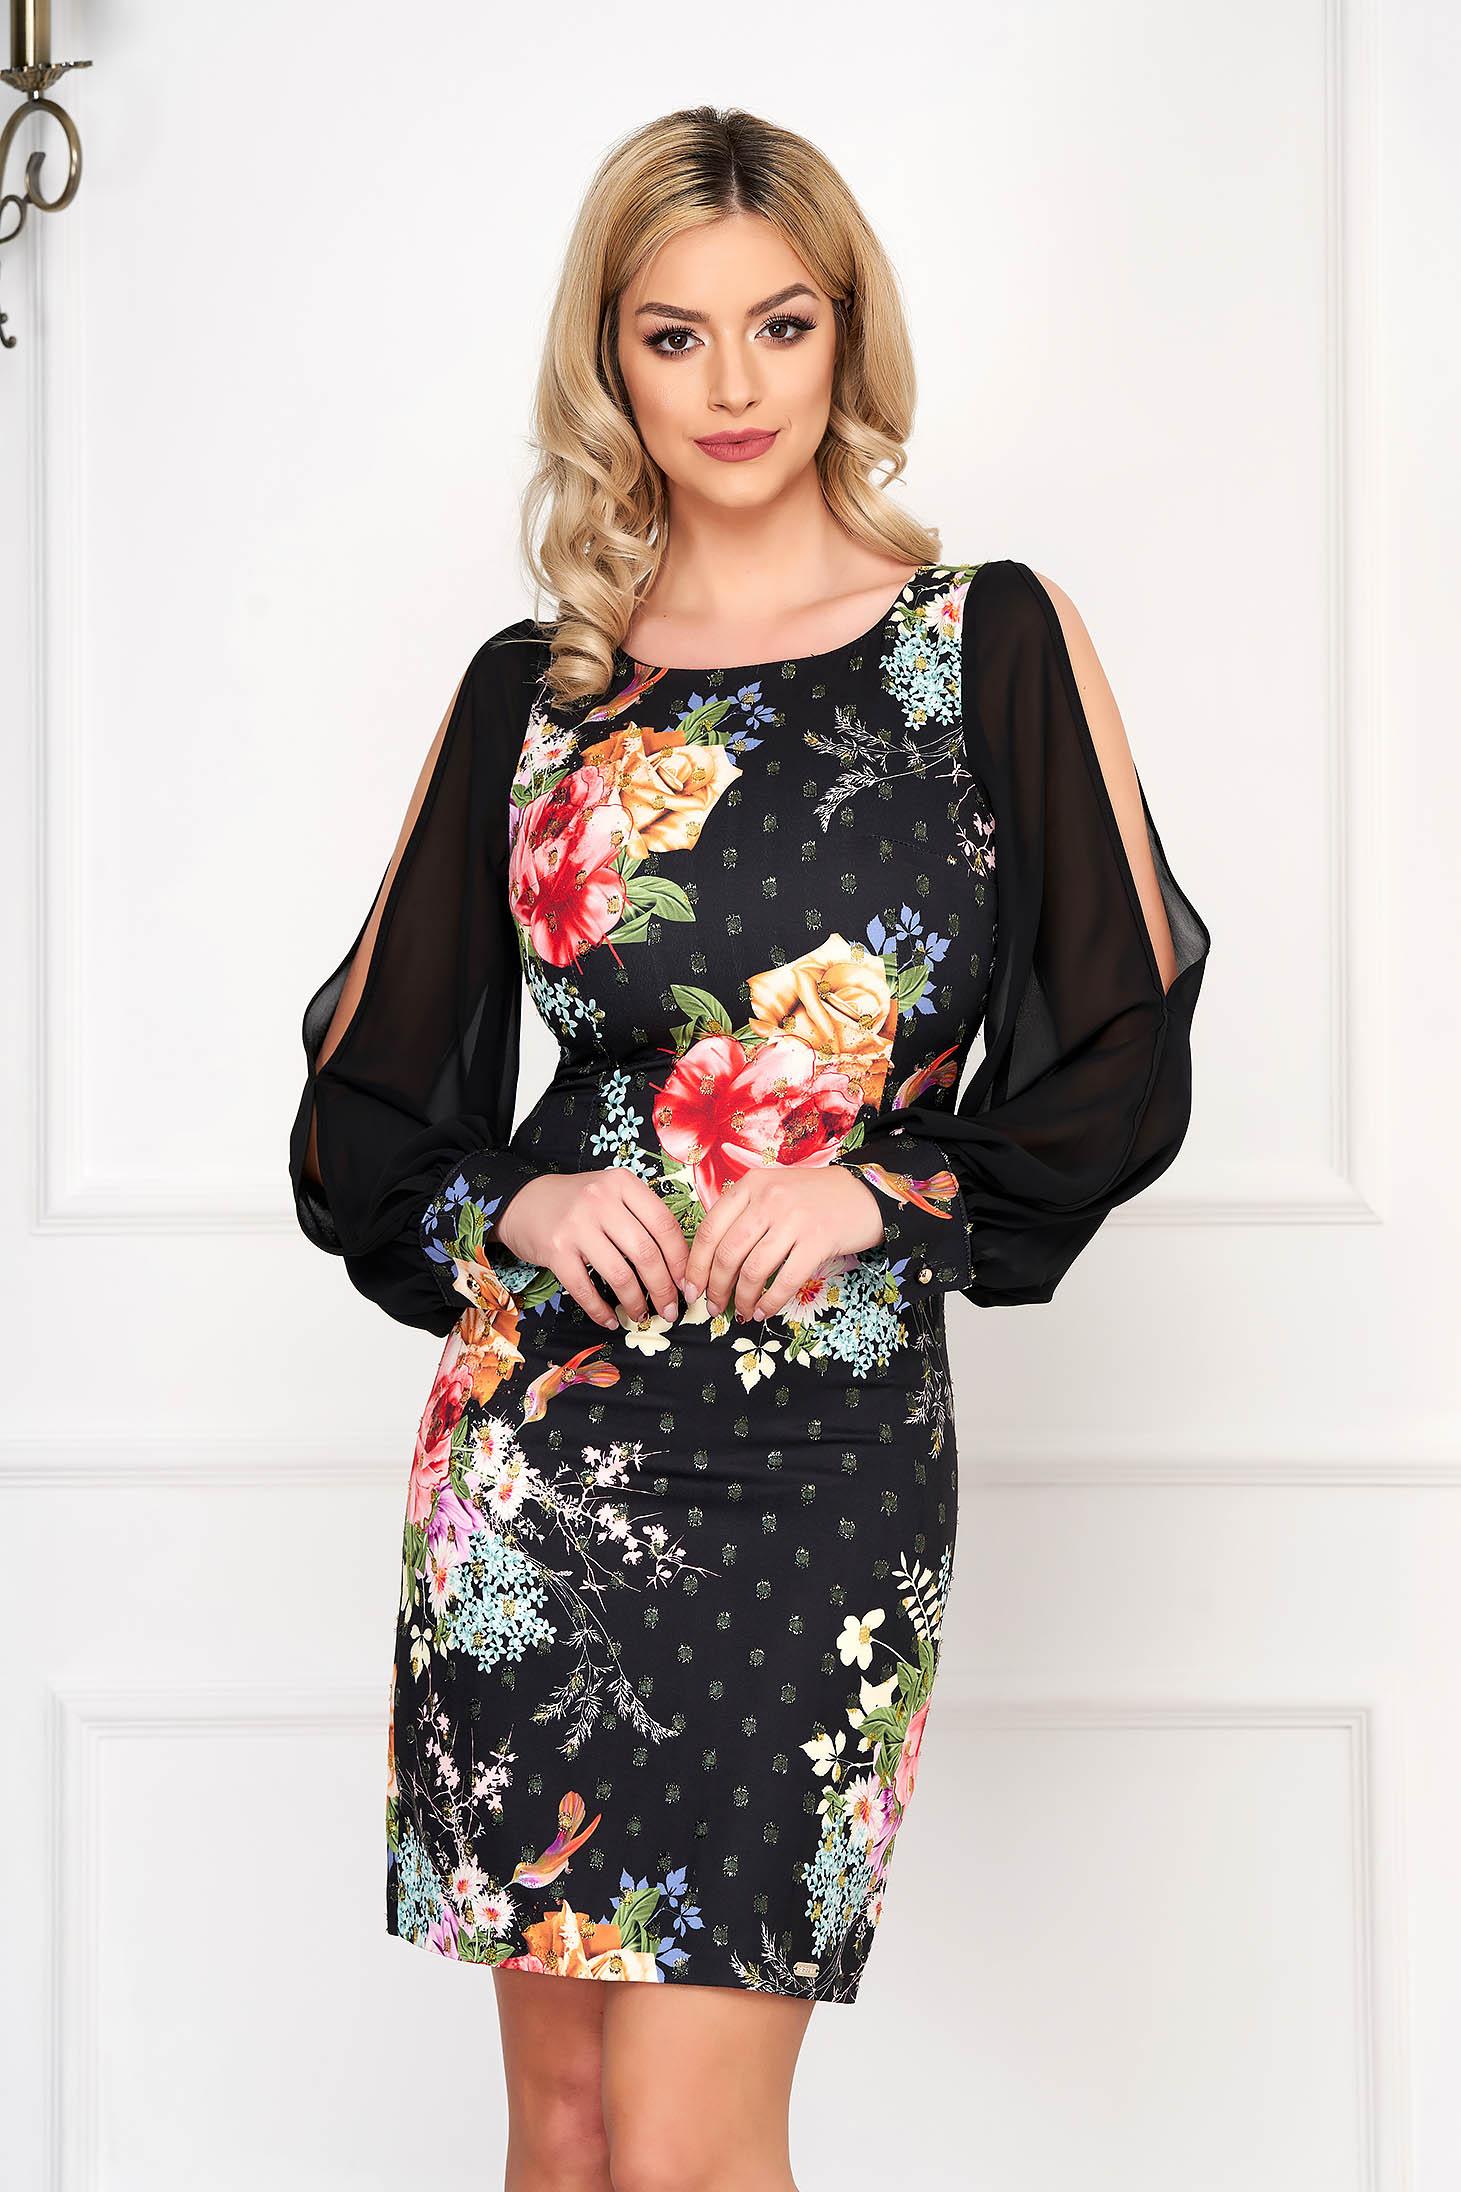 Black dress elegant short cut pencil with veil sleeves with floral print